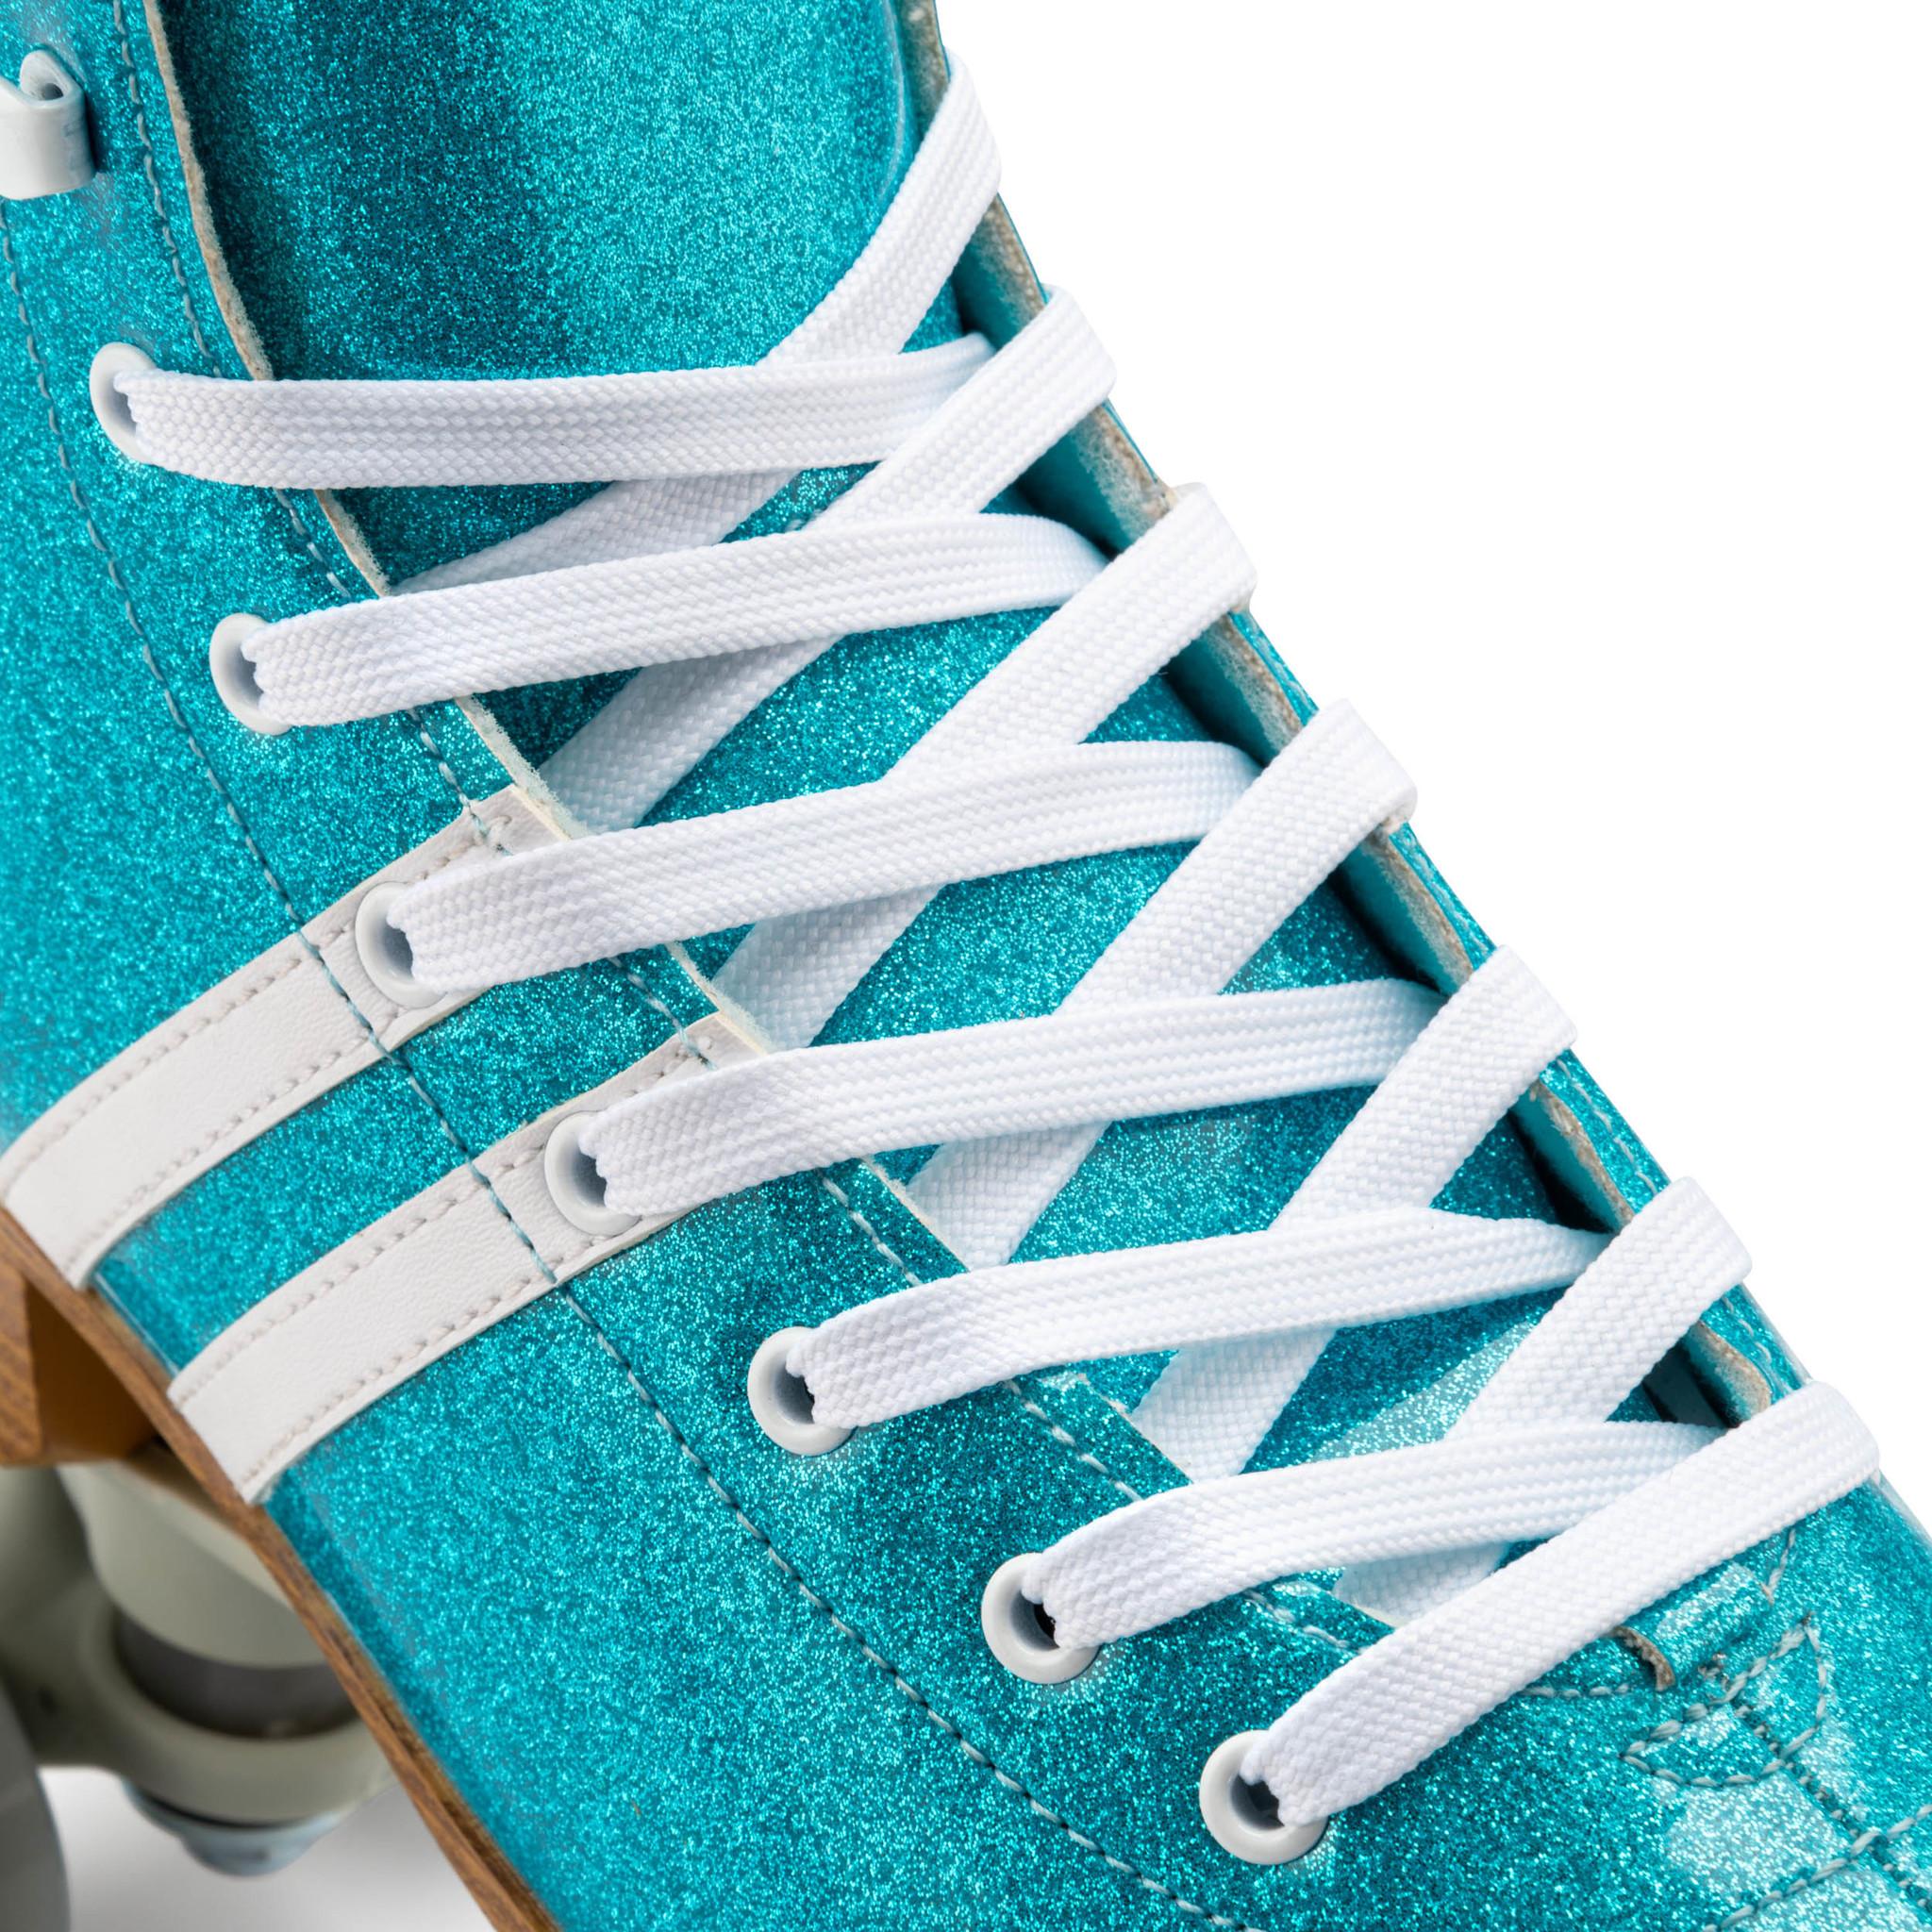 SK3003_osprey_quad_skates_high_blue_glitter